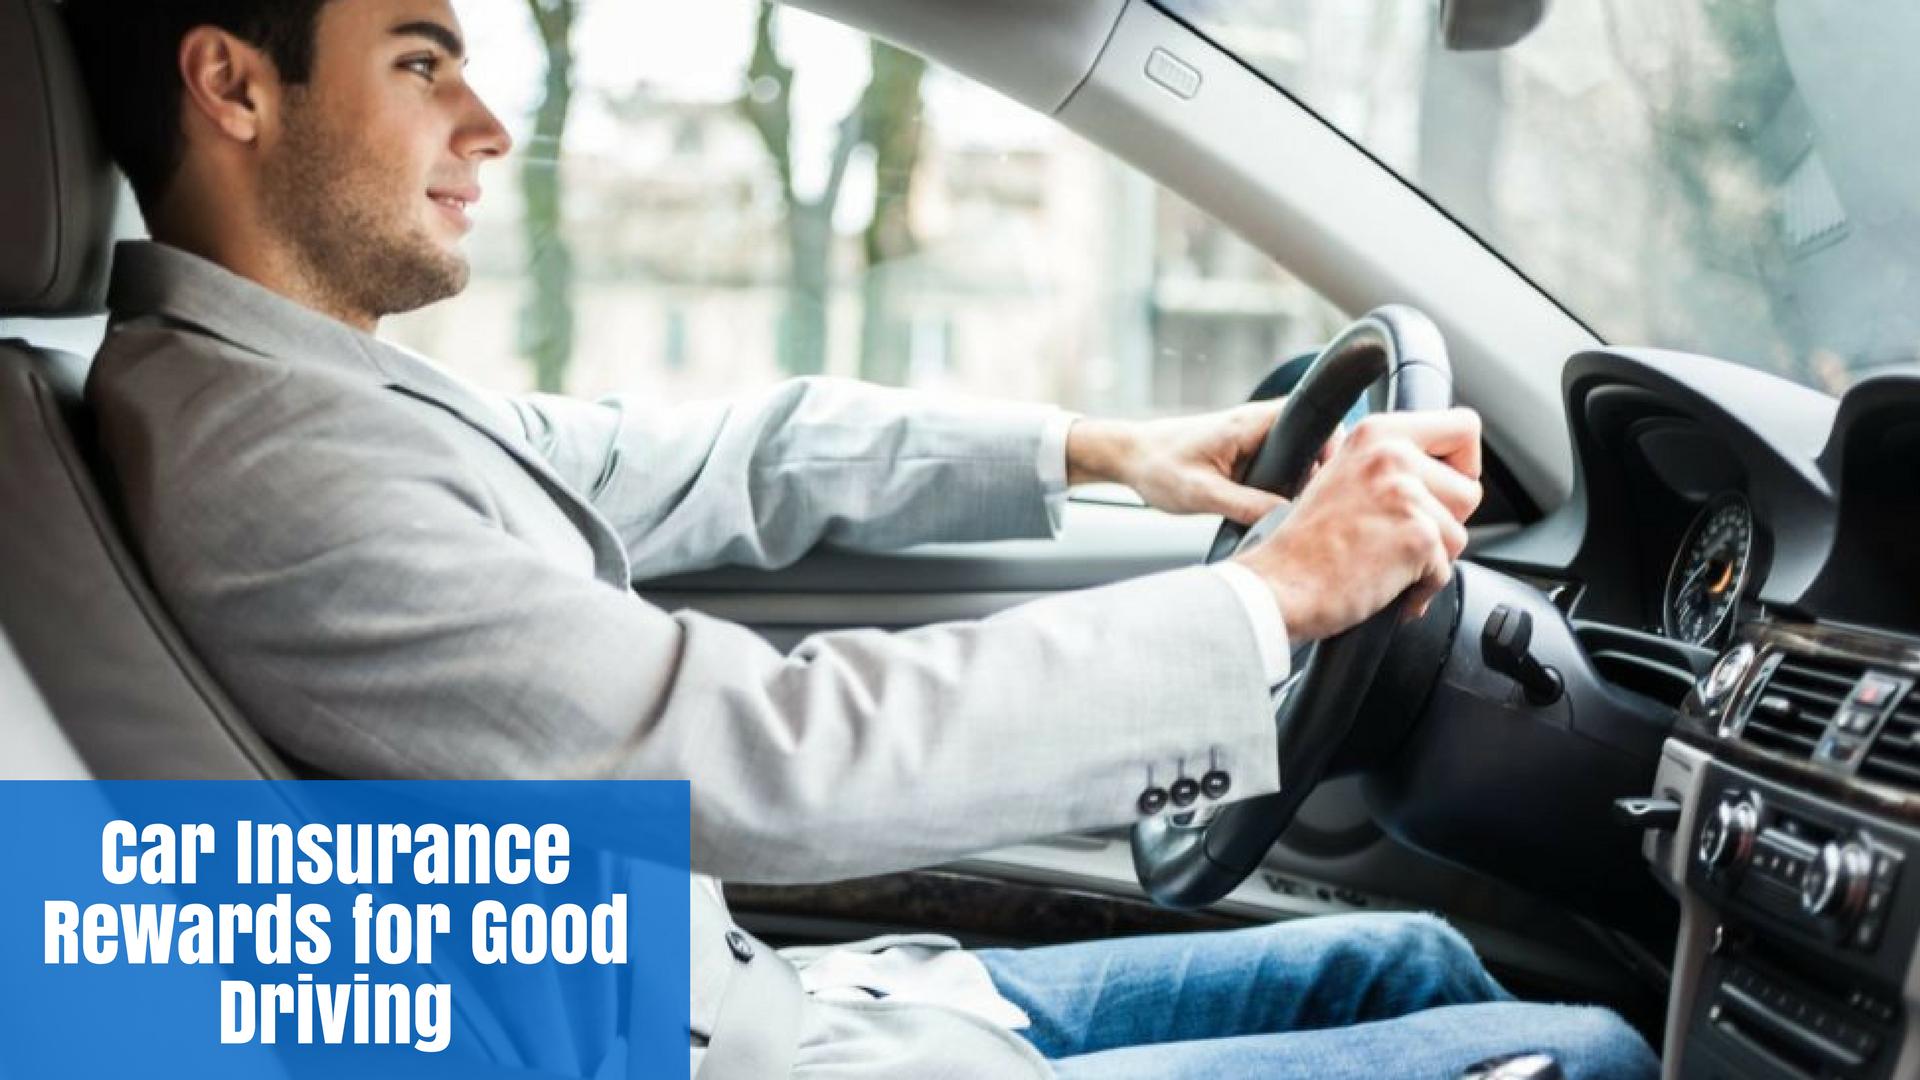 Car Insurance Rewards for Good Driving